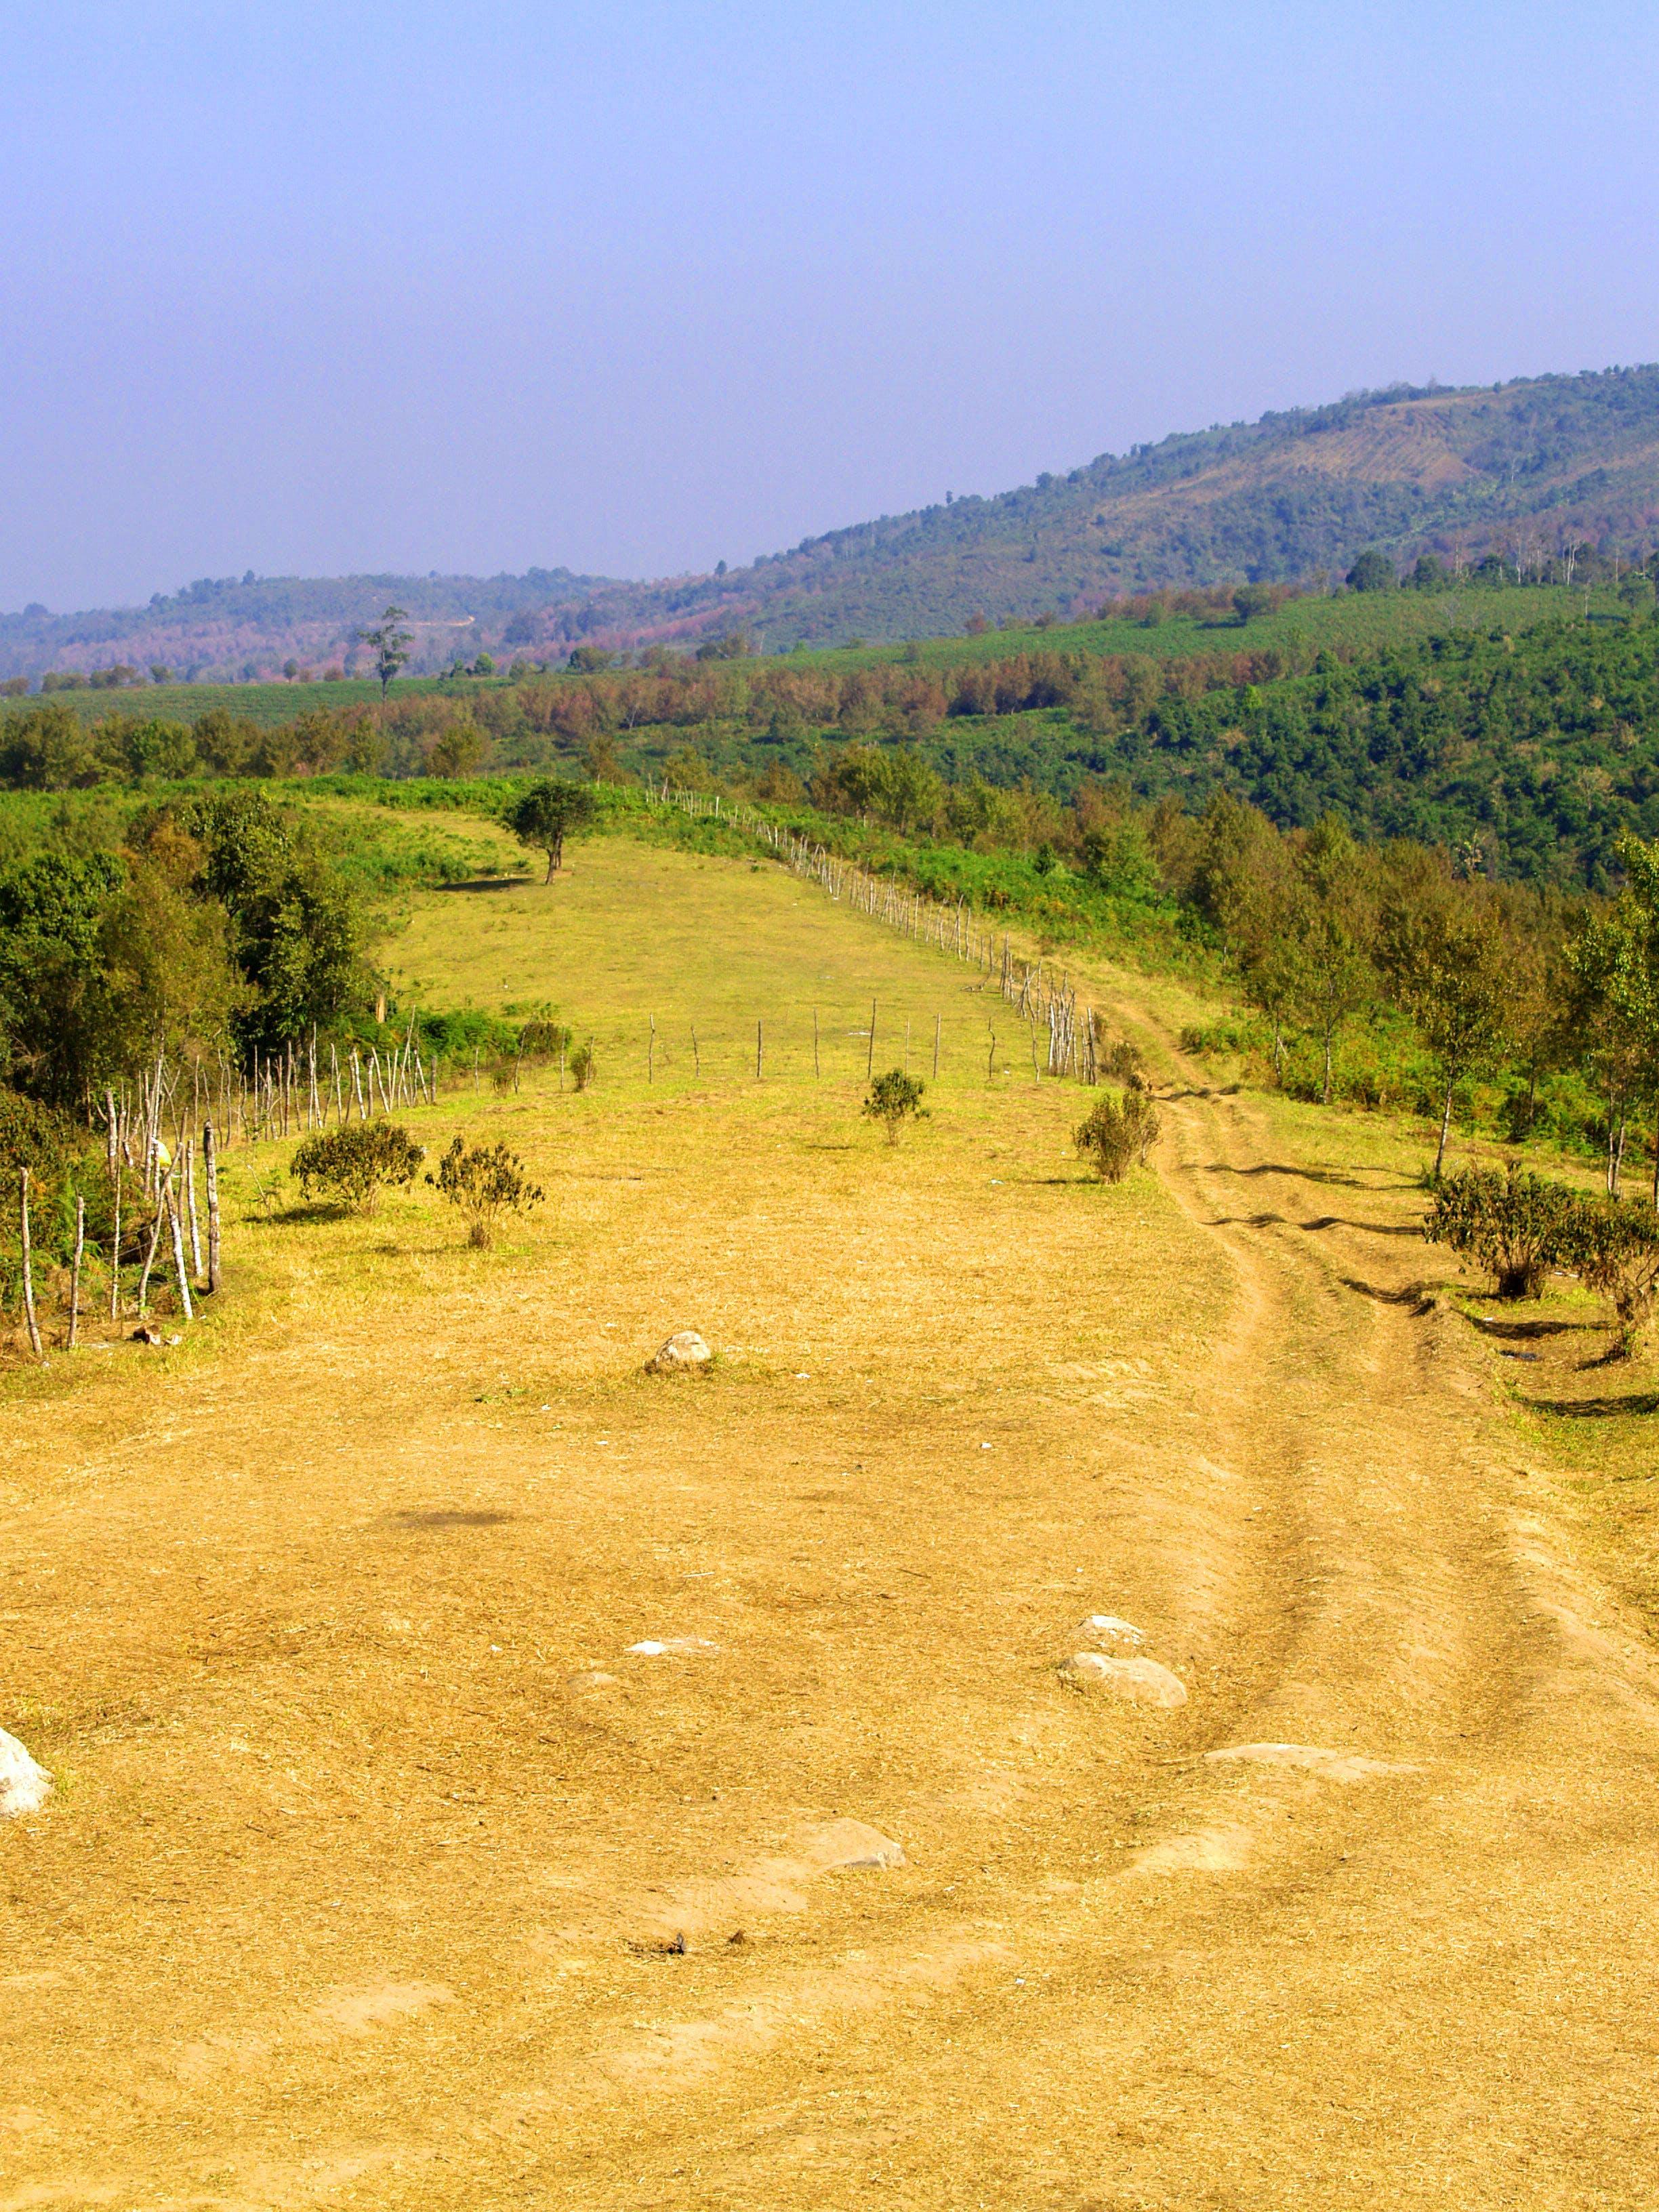 agriculture, environment, farm